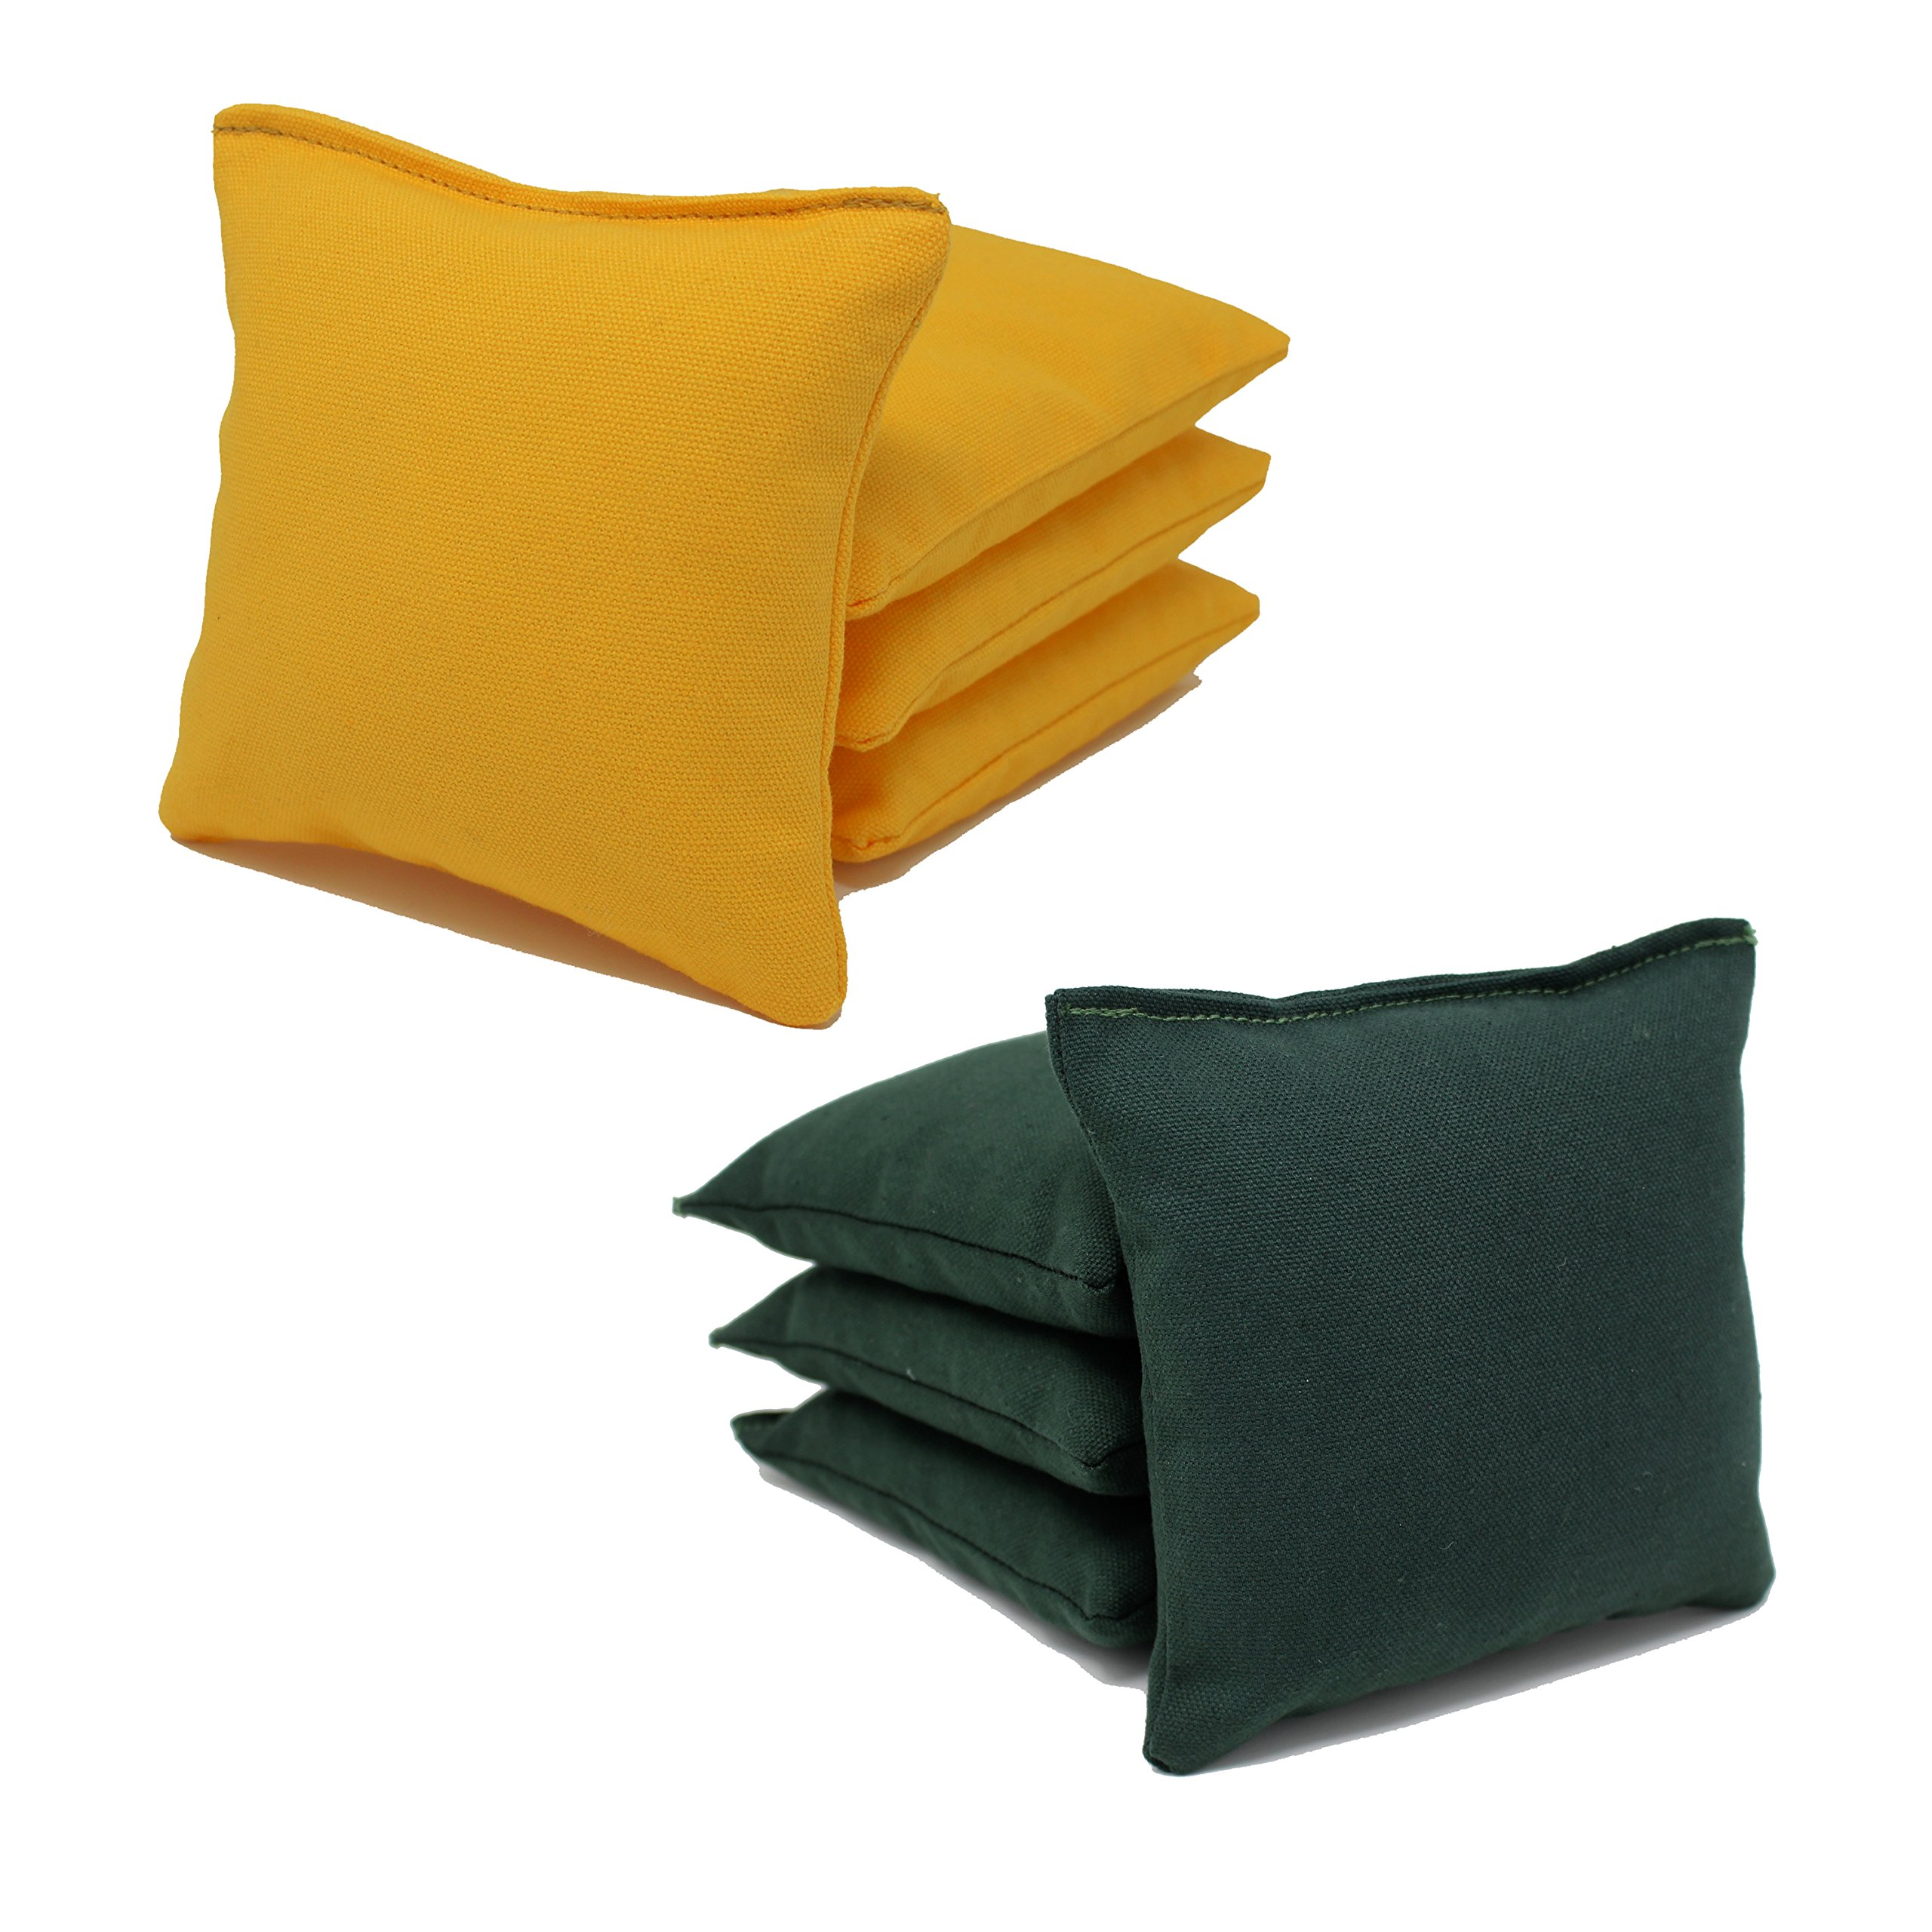 8 ACA Regulation Cornhole Bags.Corn-Filled 25 Colors (Hunter Green/Yellow) by Free Donkey Sports